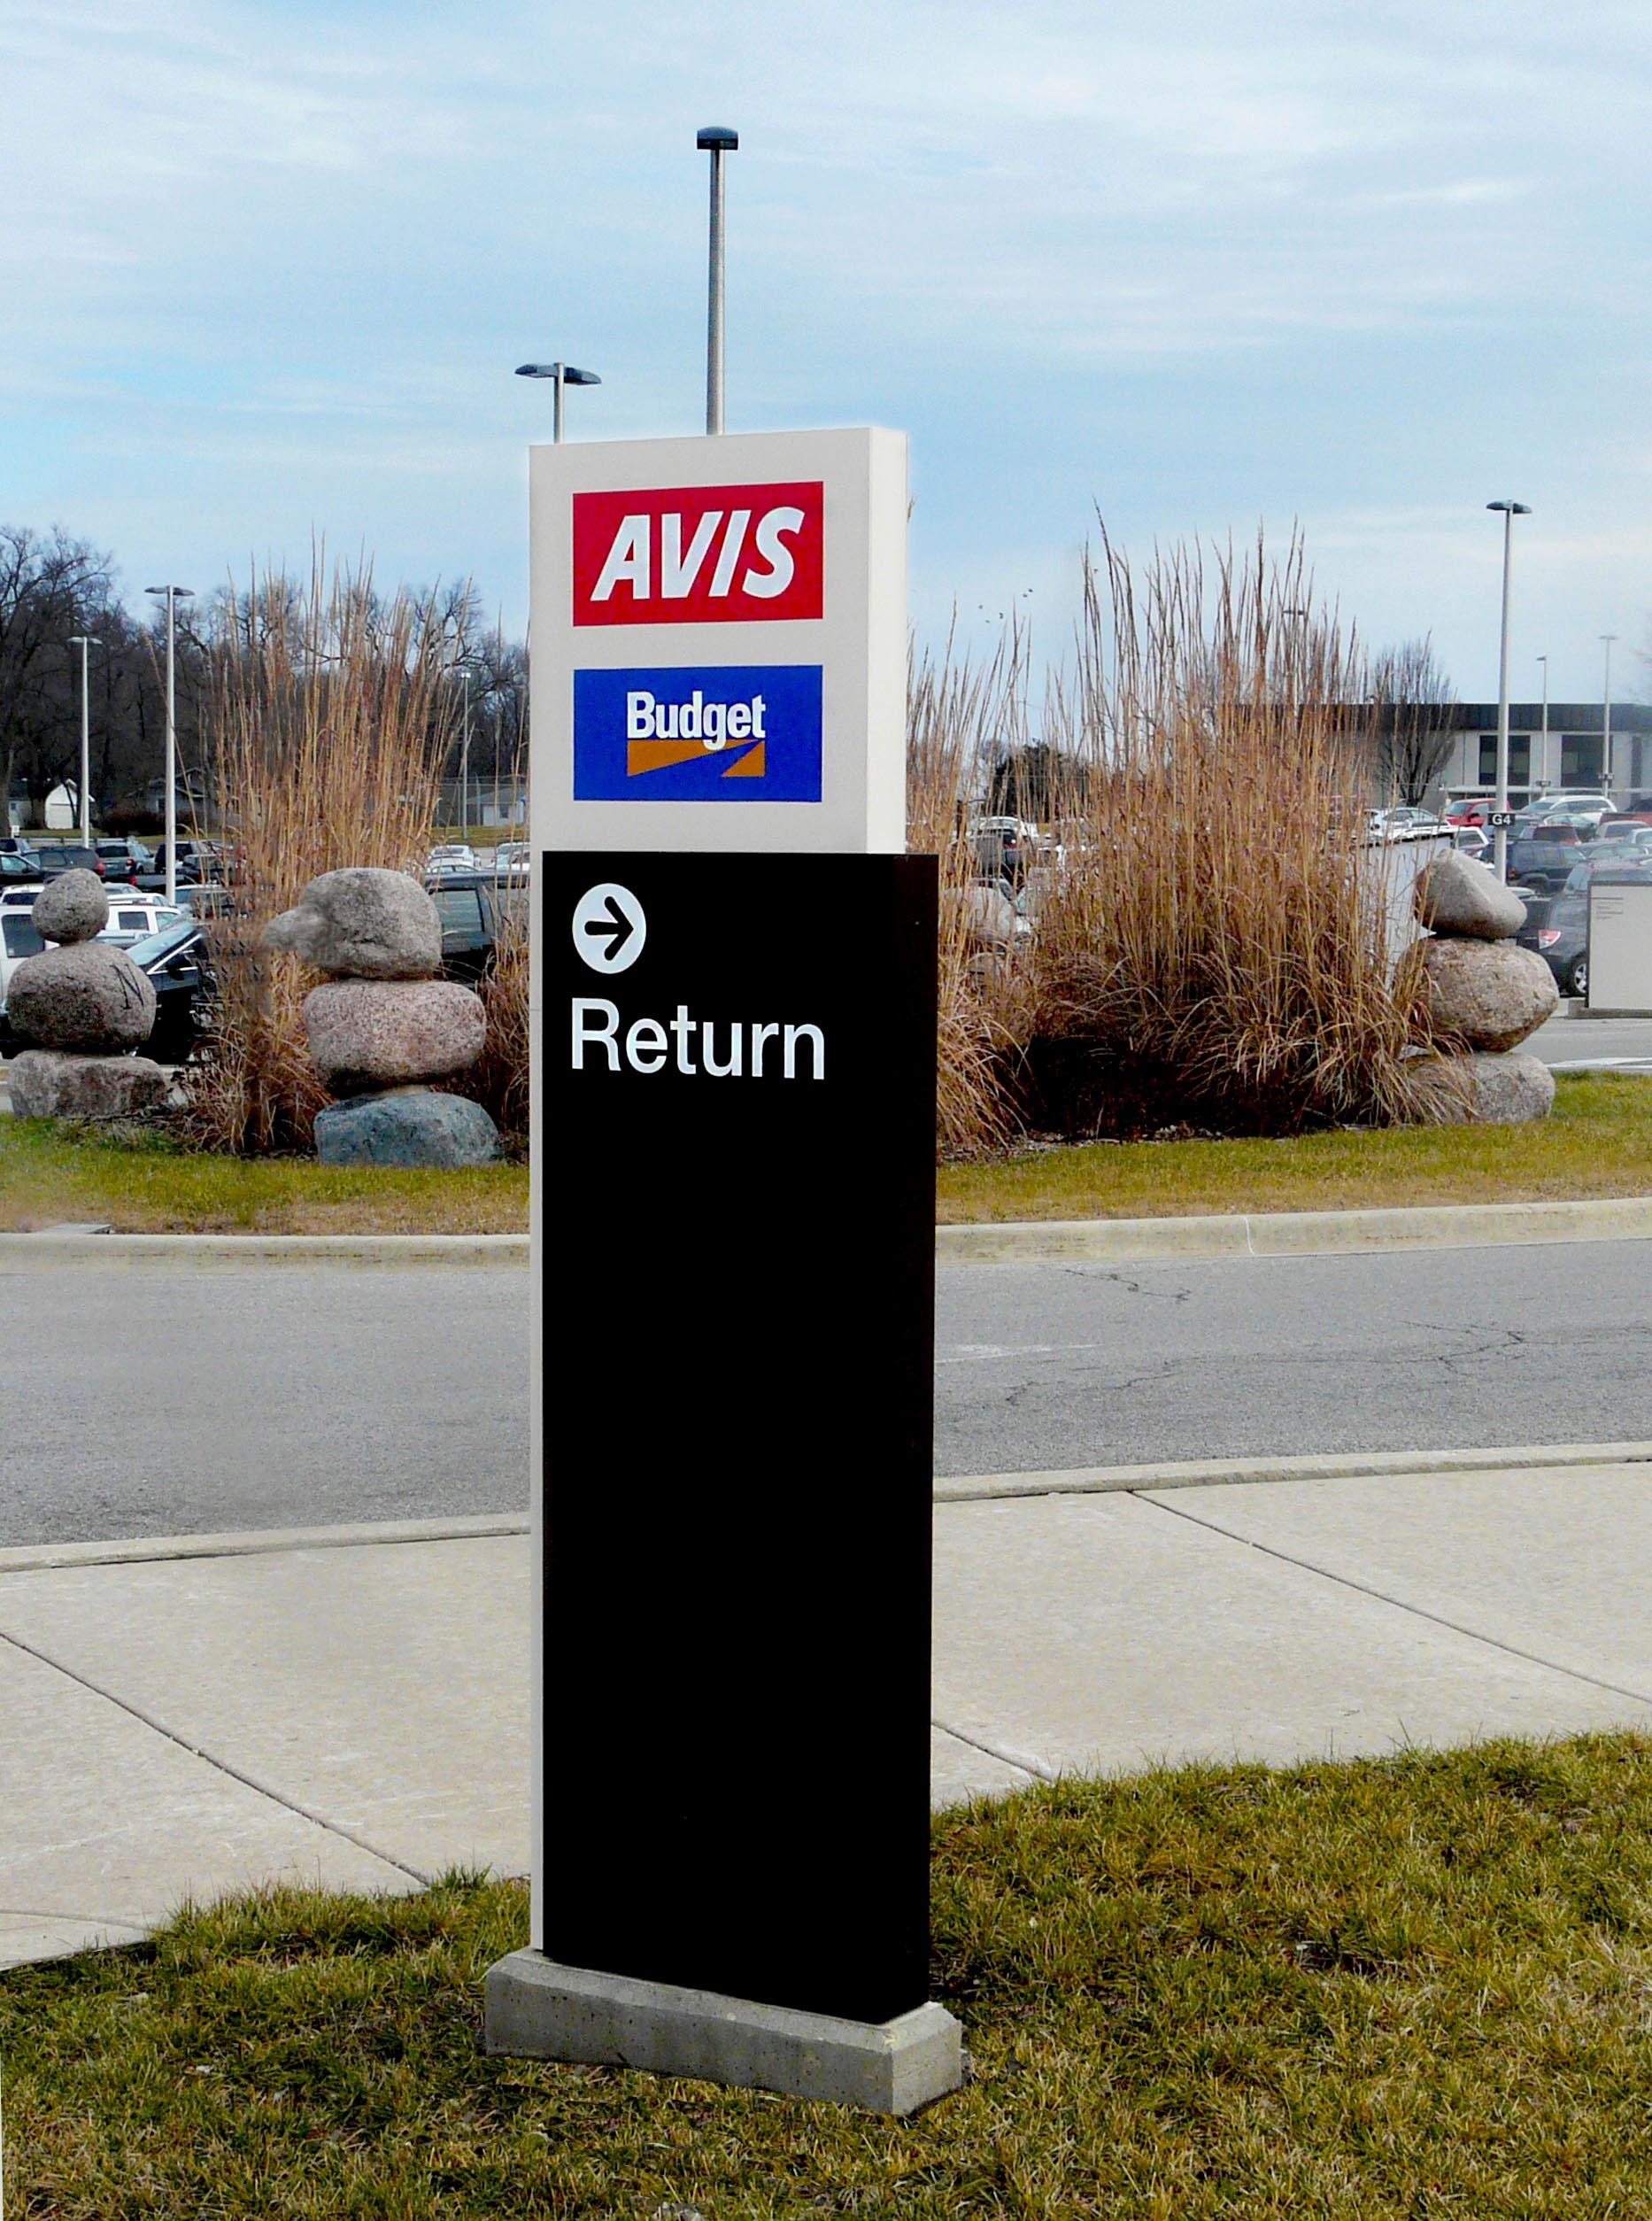 Rental Car Signage At Peoria Airport